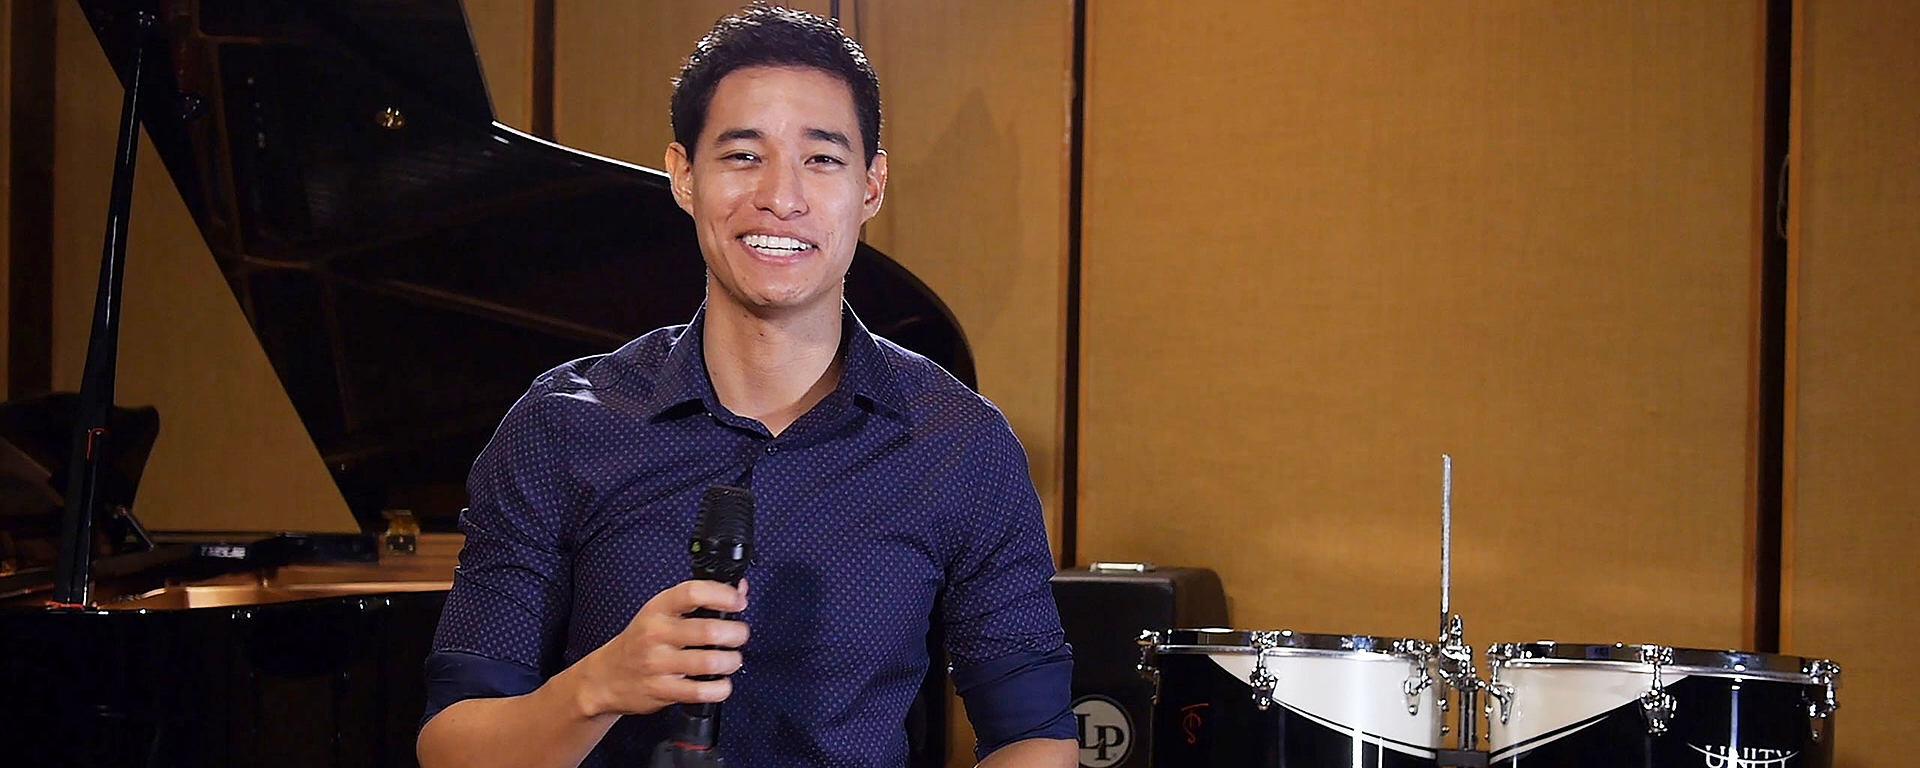 Tony Succar uses LEWITT microphones